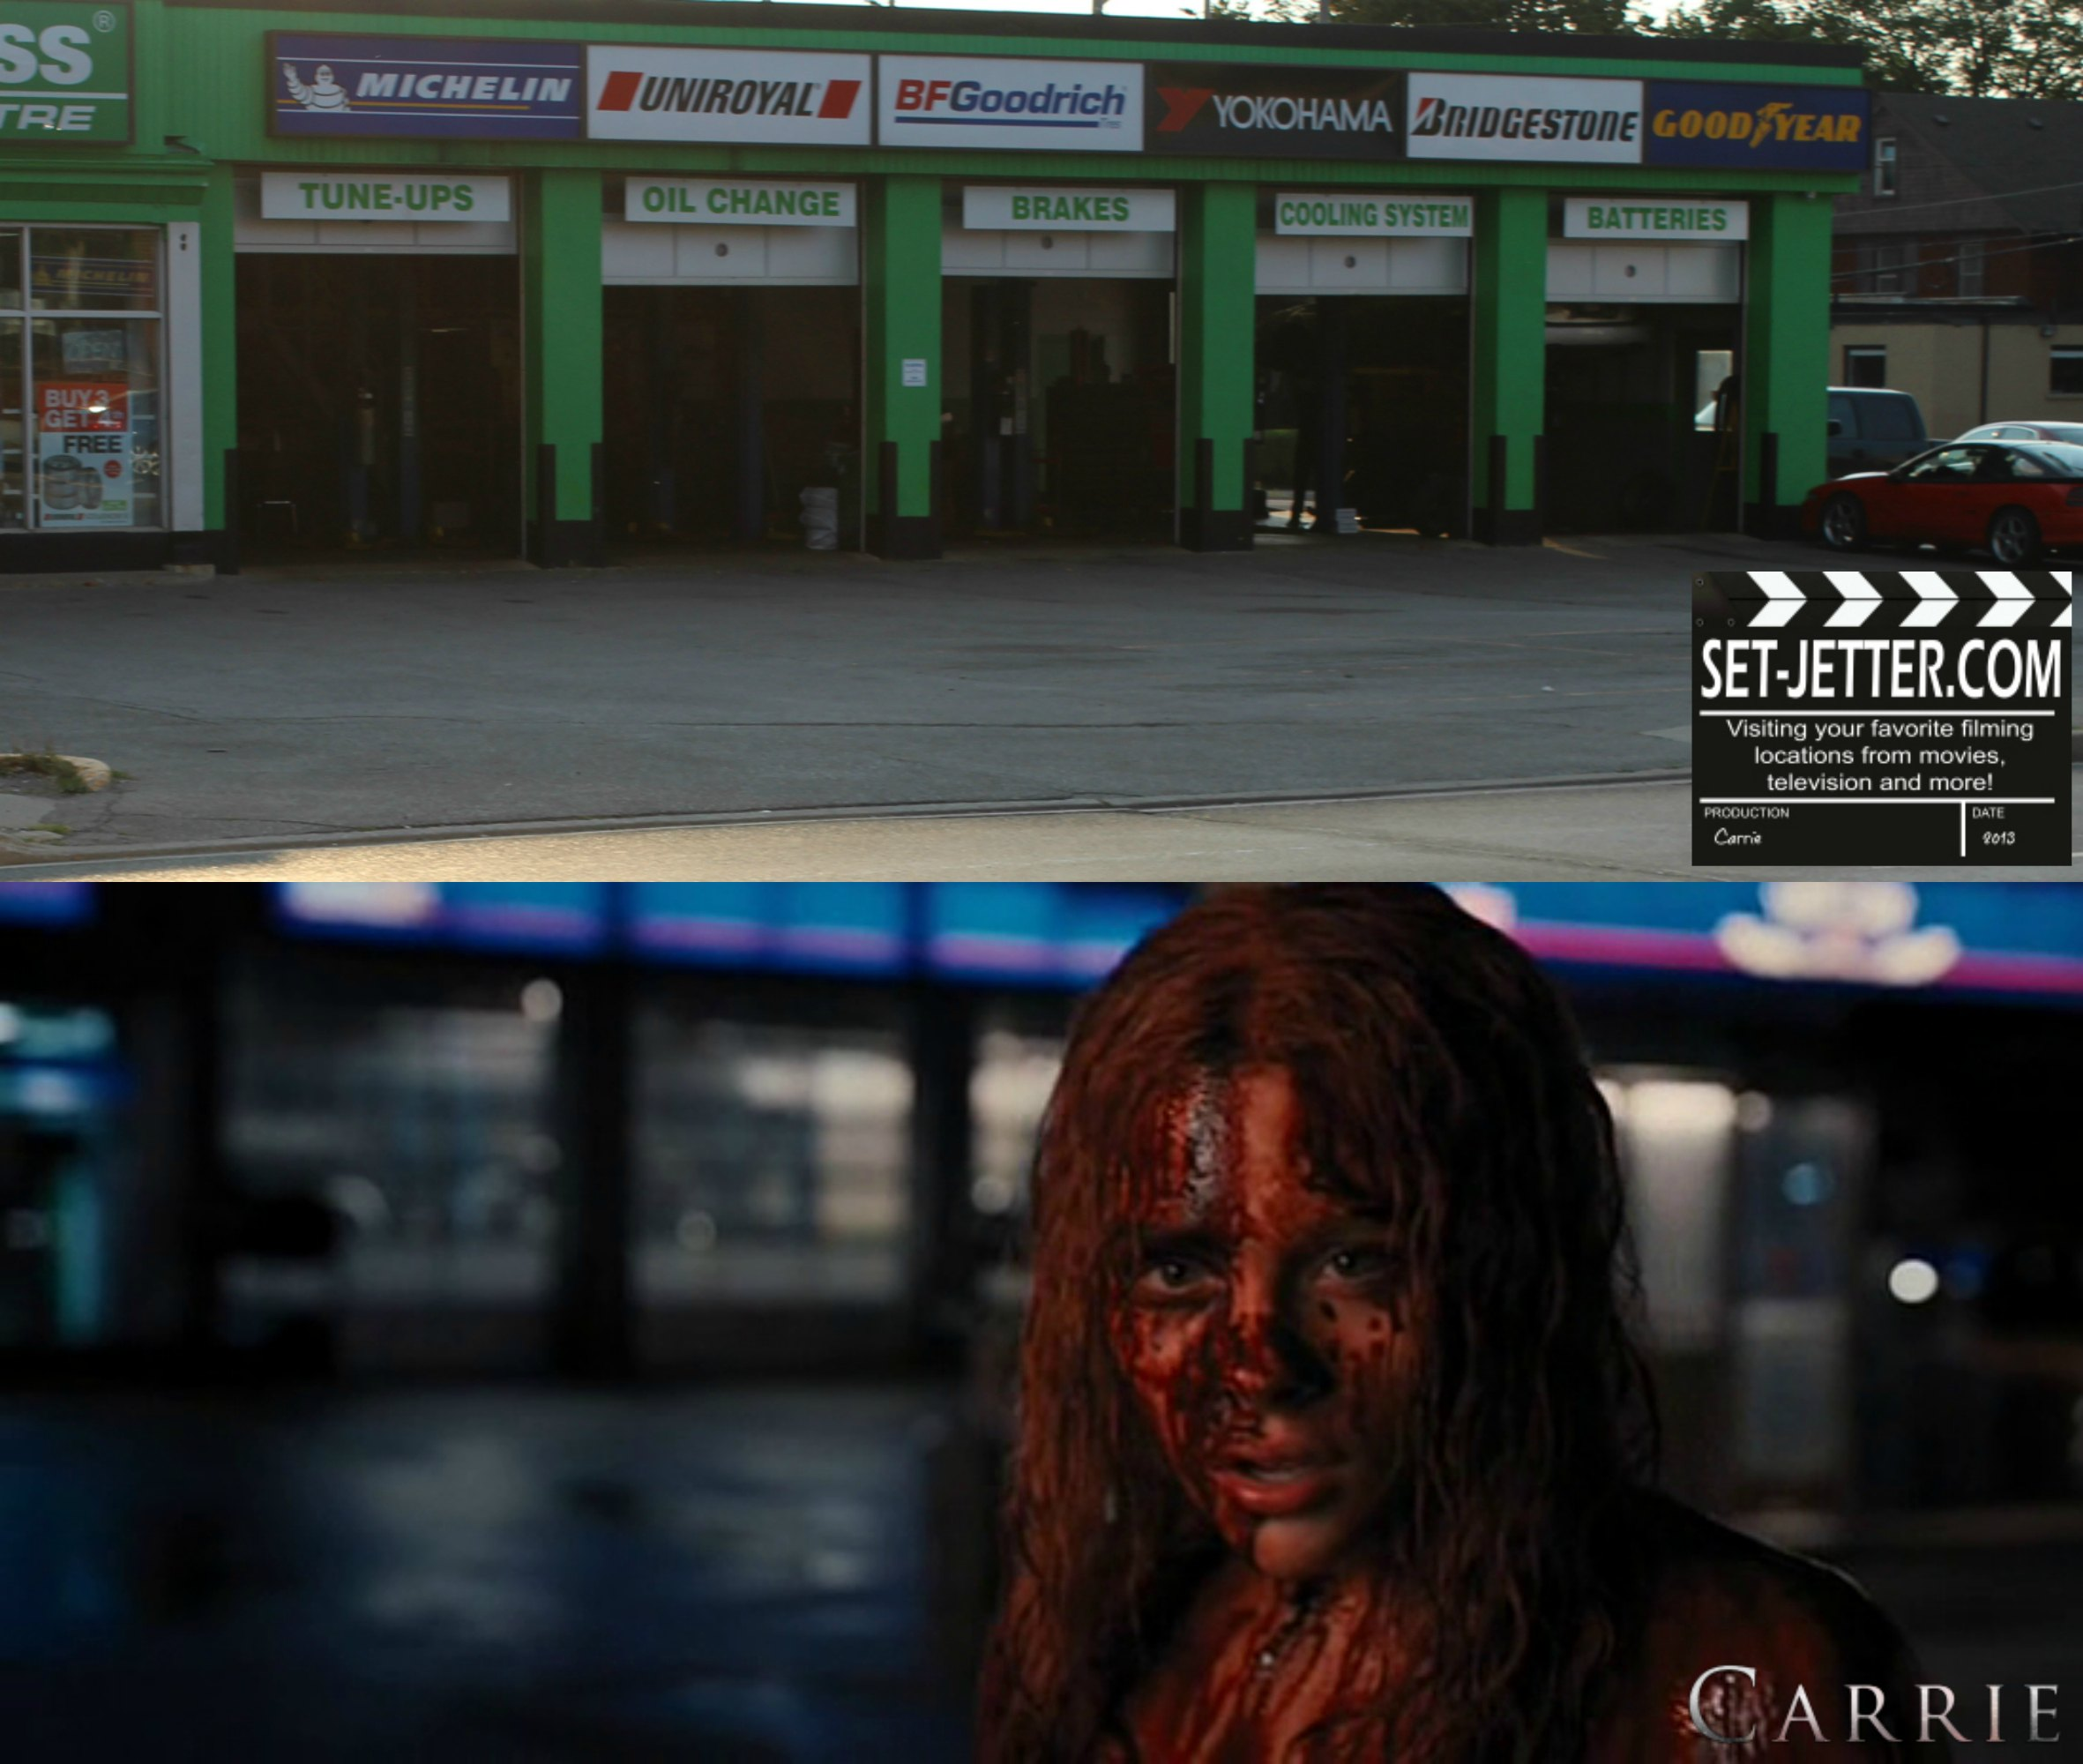 Carrie 2013 comparison 183.jpg